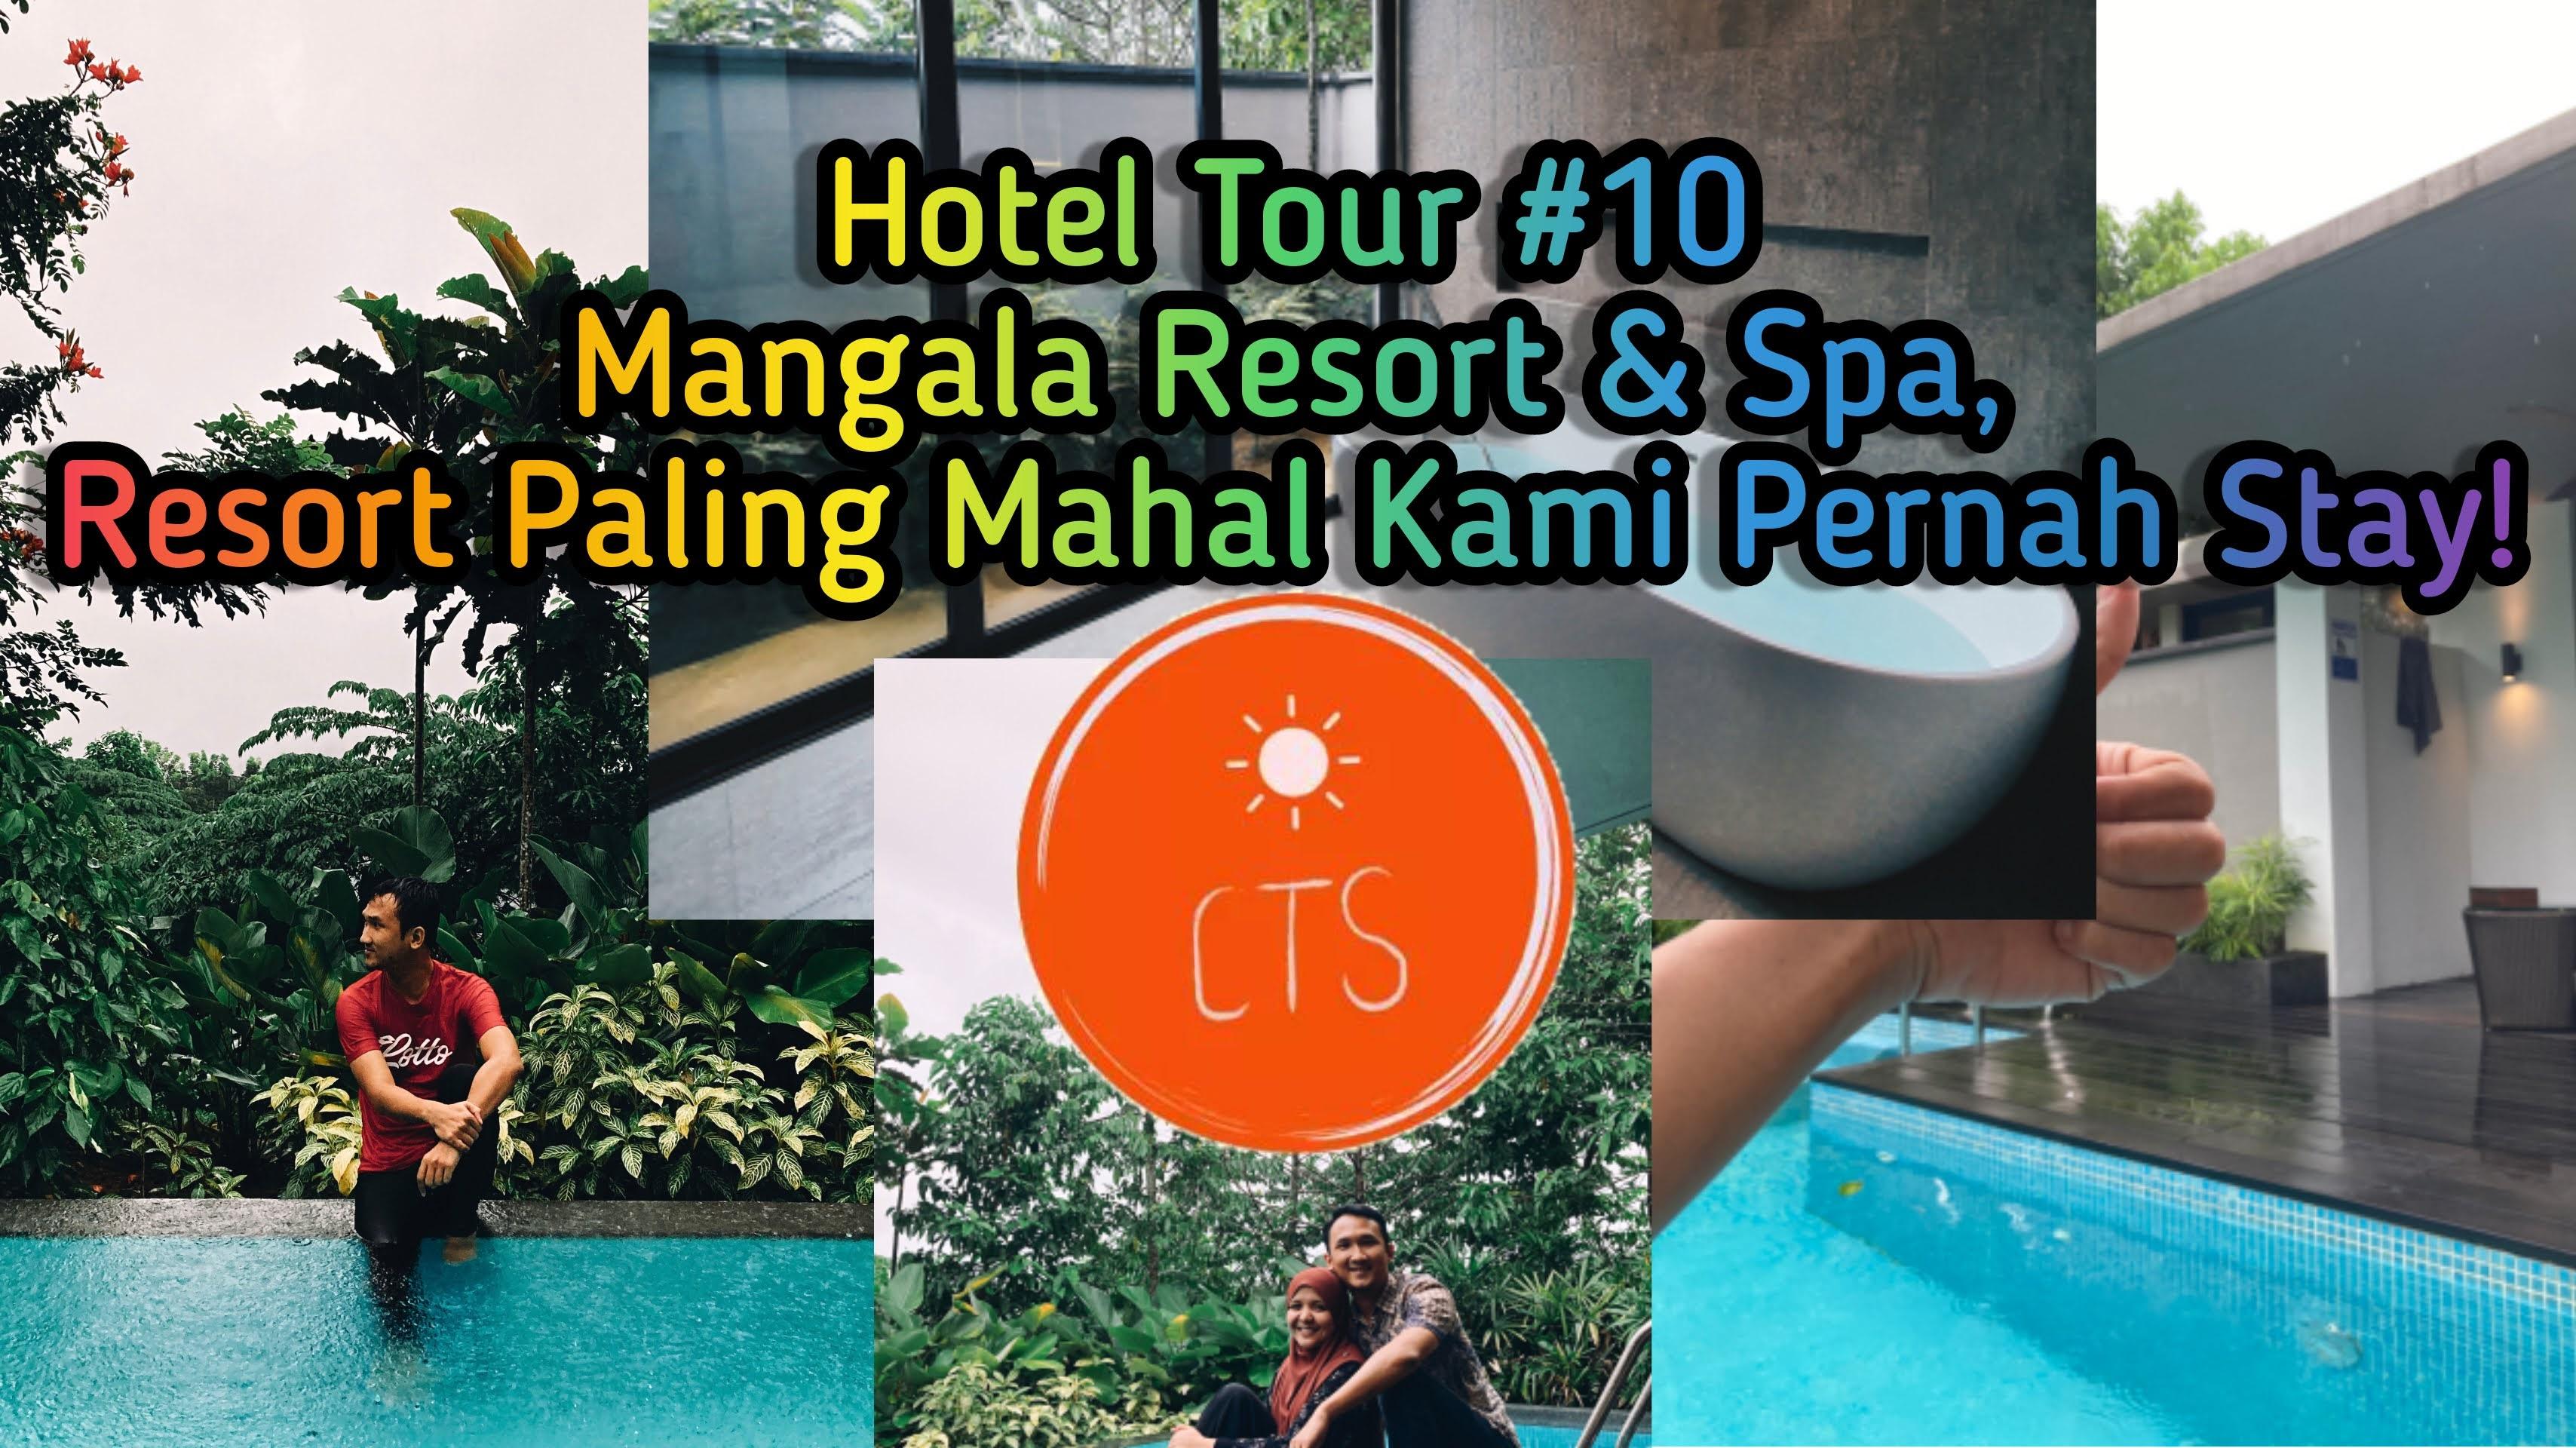 Hotel Tour #10 : Mangala Resort & Spa , Hotel Termahal Kitorang Pernah Stay | HanaKimi Anniversary Roadtrip 2020